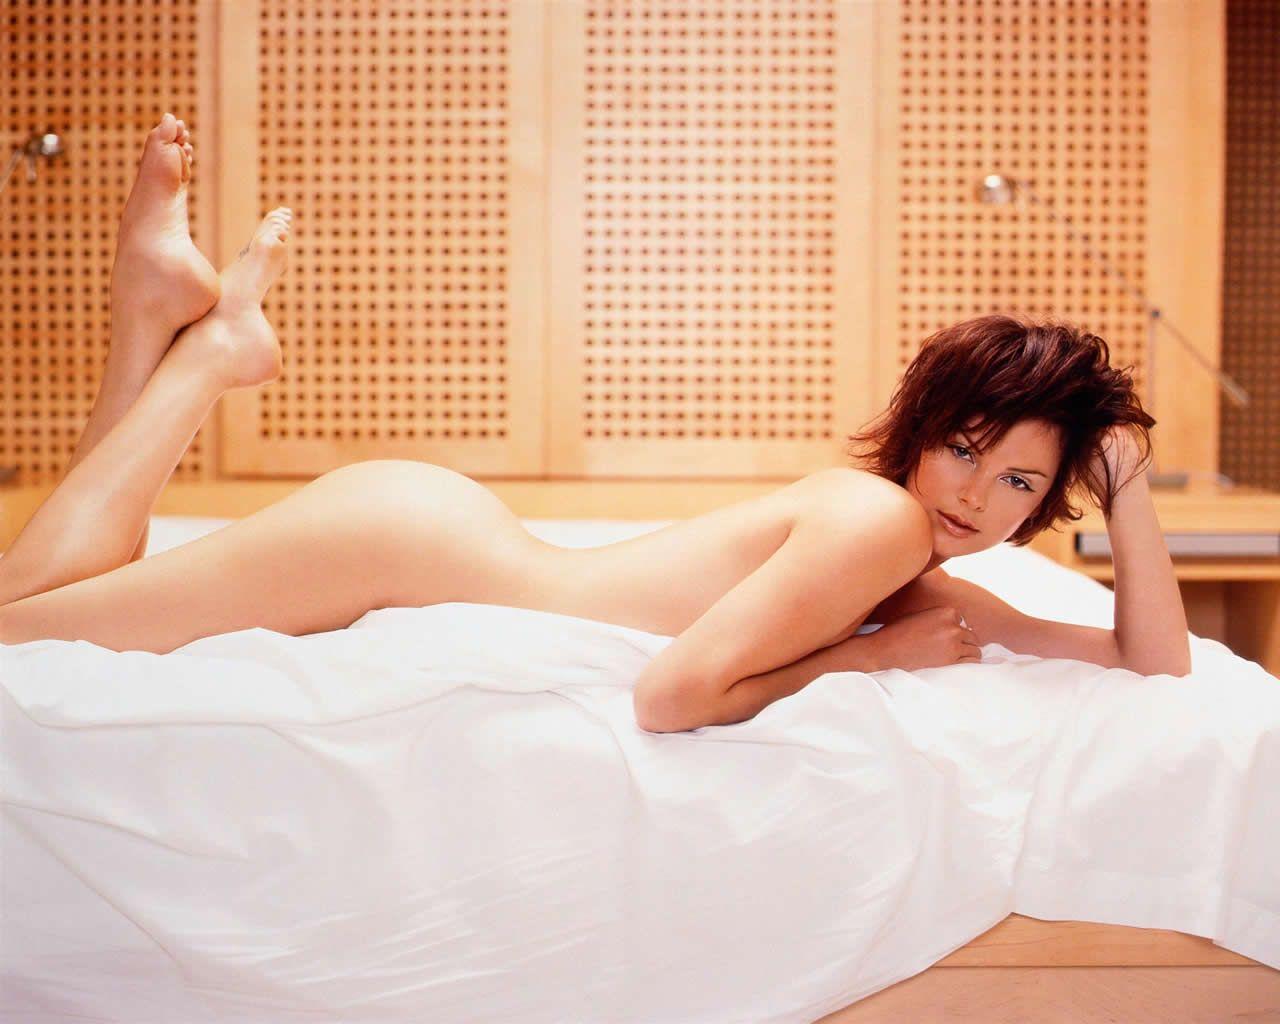 http://4.bp.blogspot.com/-cpT3Aba12Zw/TVQObMPDrwI/AAAAAAAABHI/KNSXFPzEoYA/s1600/charlize_theron_lying_1280x1024.jpg